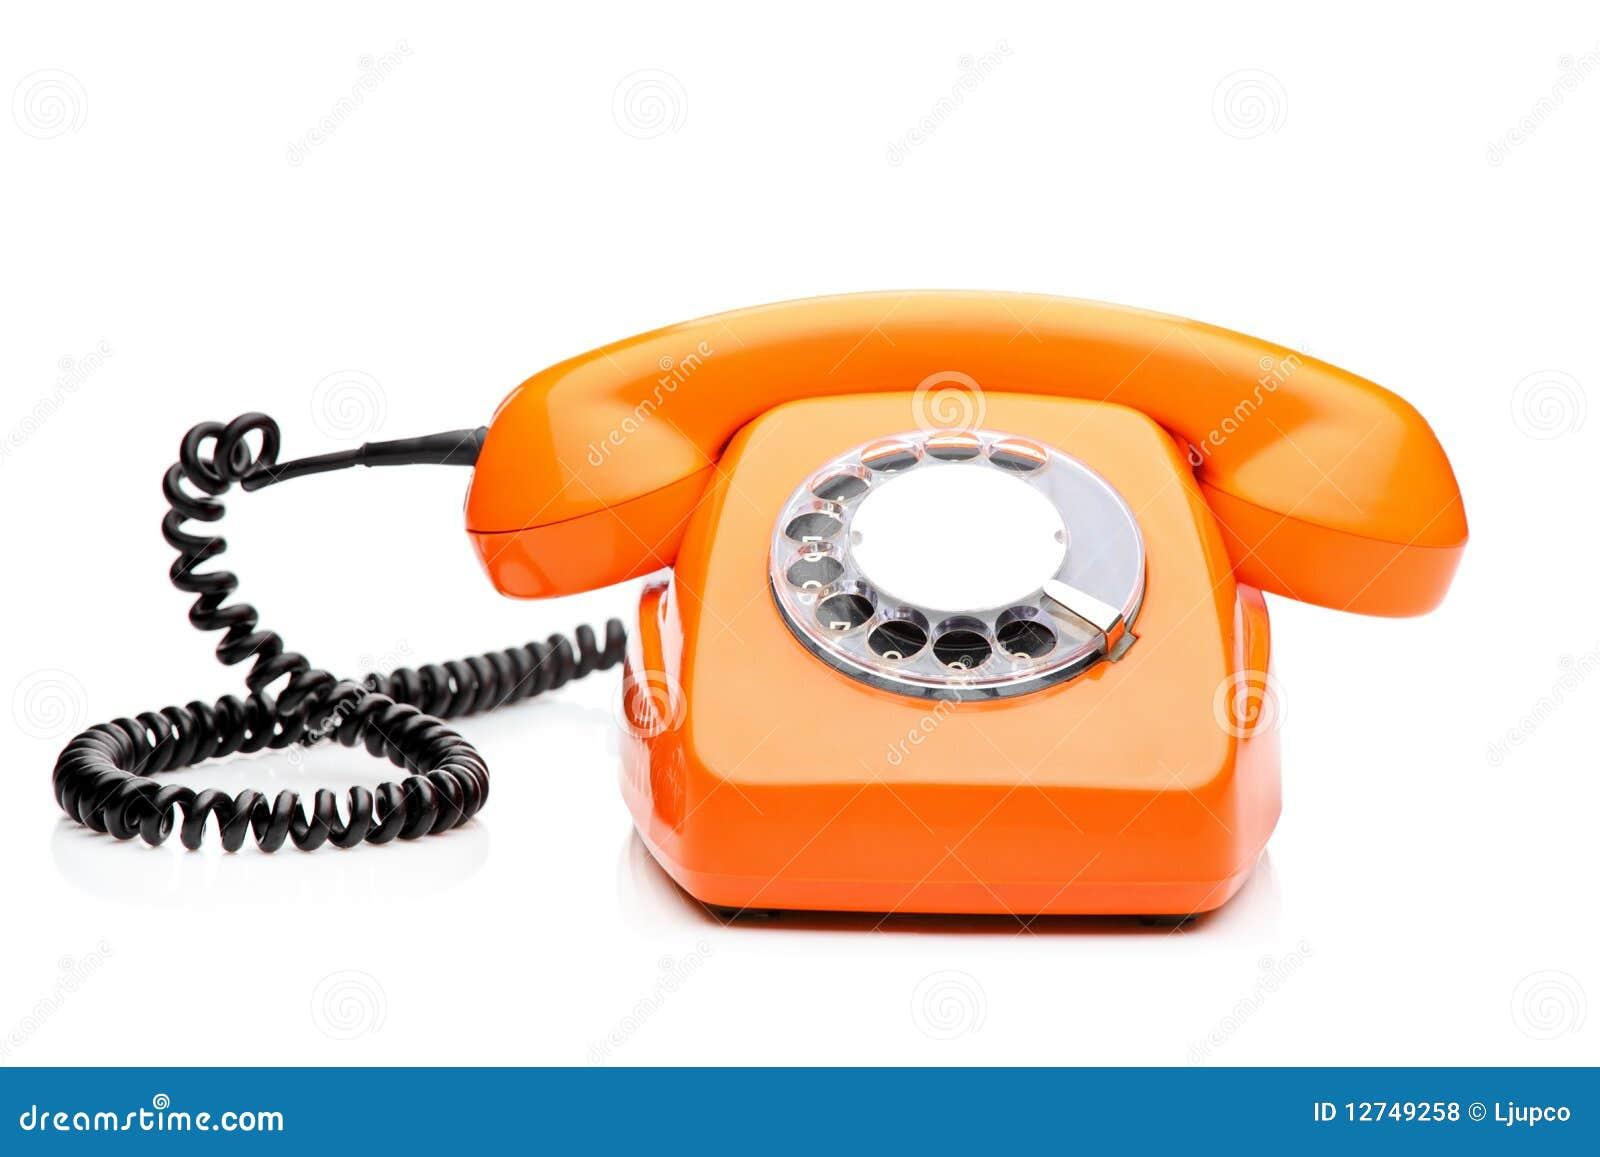 A Retro Orange Phone Royalty Free Stock Photos Image 12749258